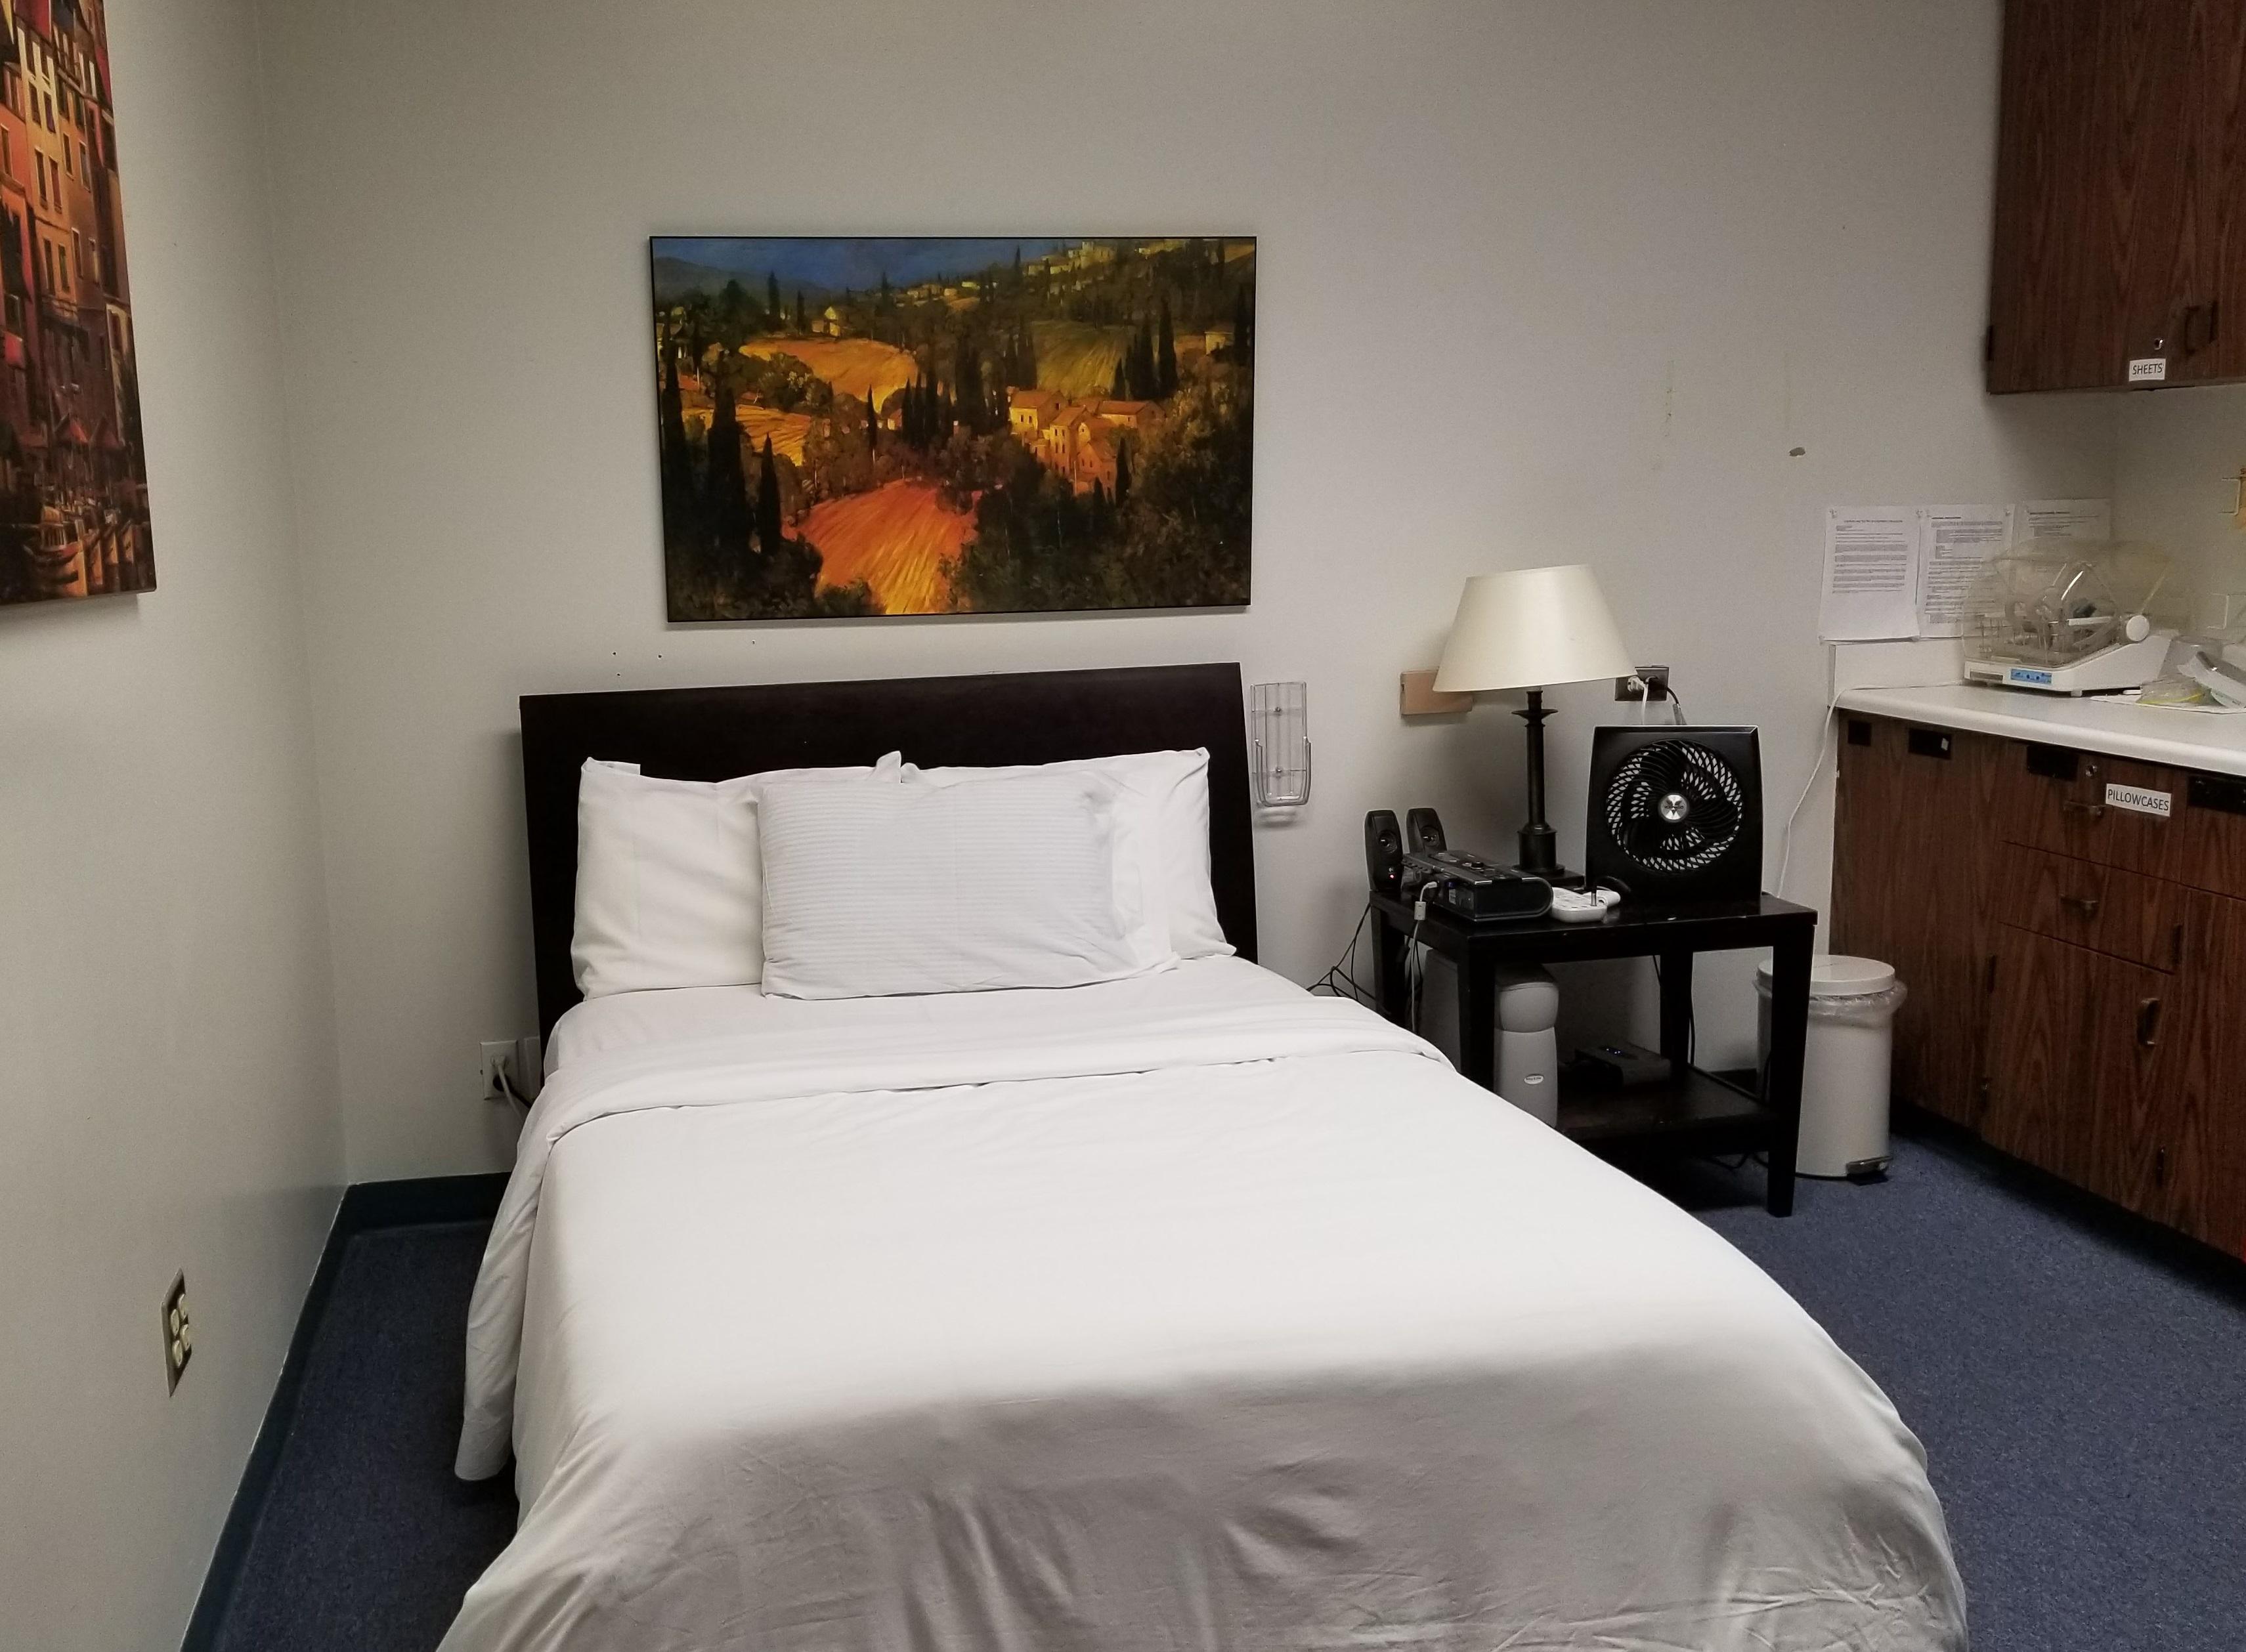 West Covina sleep center 1250 - Advanced Sleep Medicine Services - room